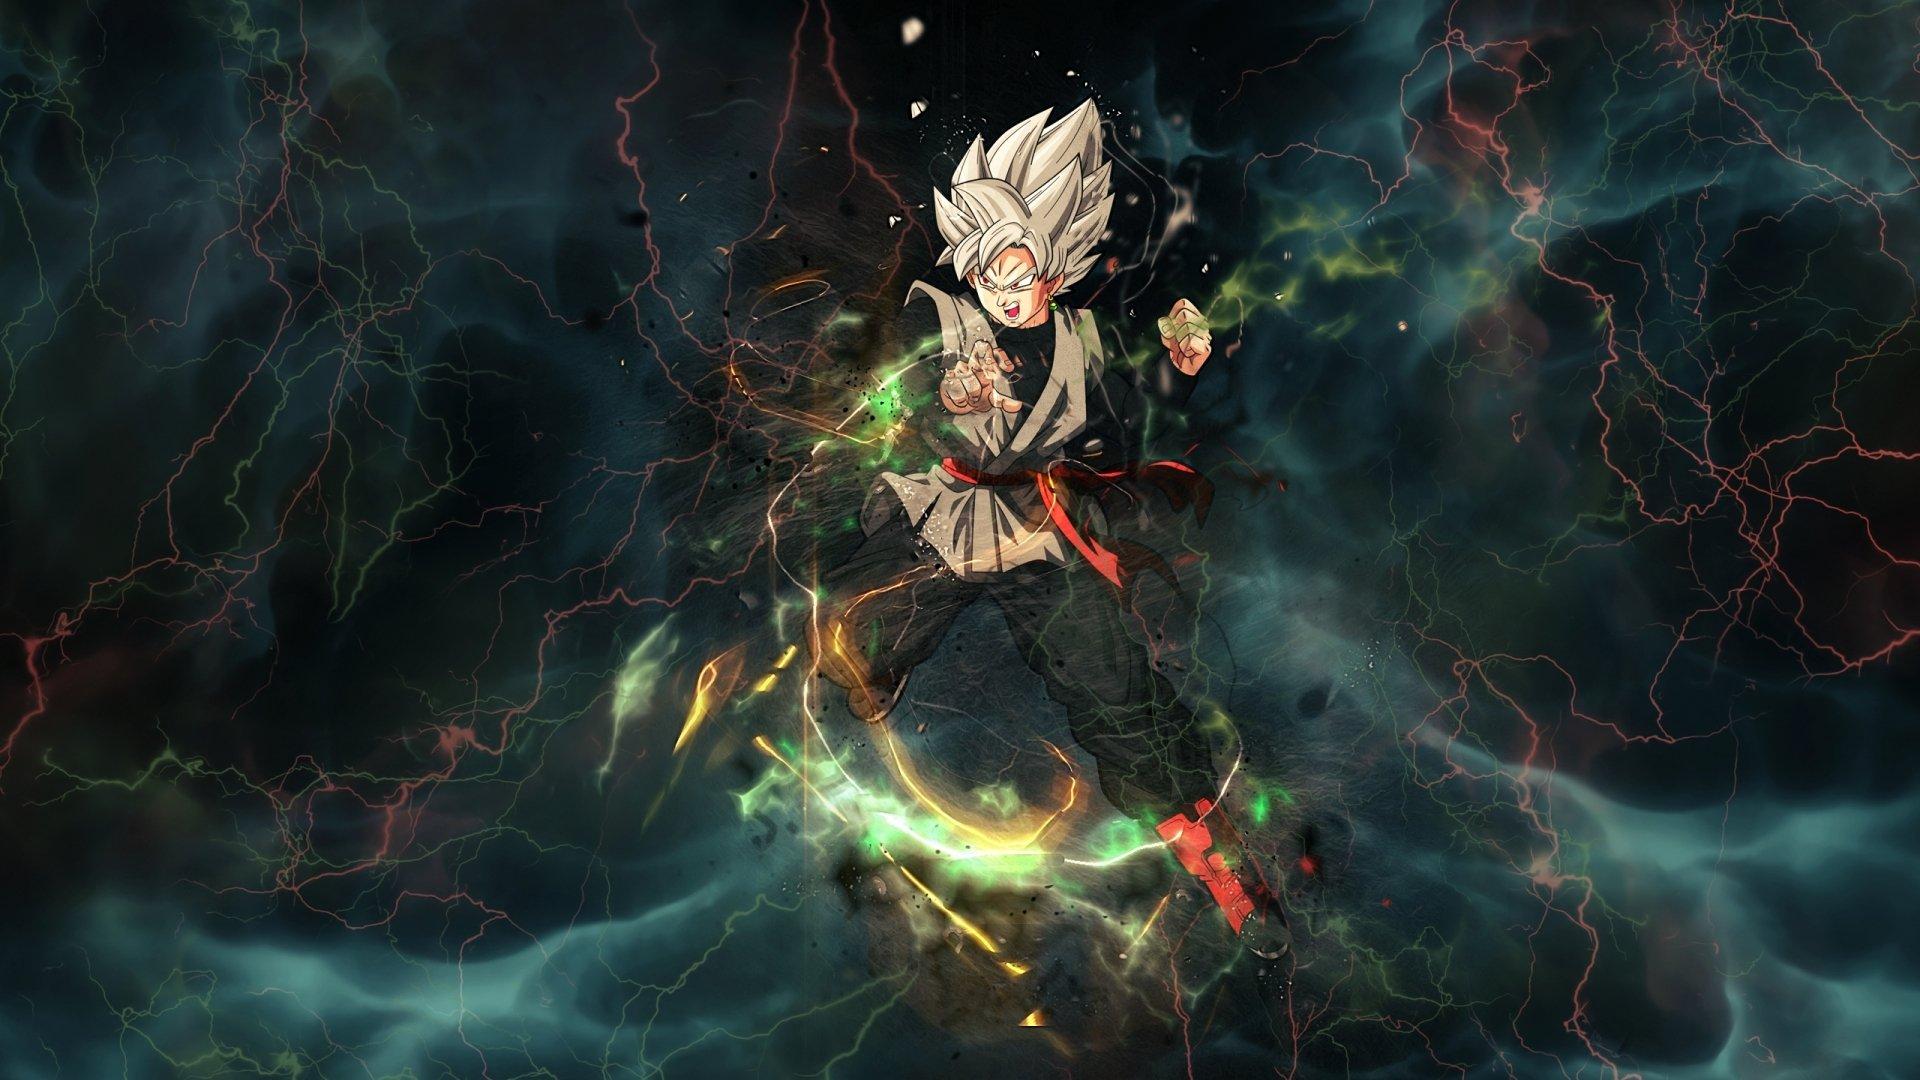 Thunder Goku Black Dragon Ball Super Anime Wallpaper 2k Quad Hd Id 3226